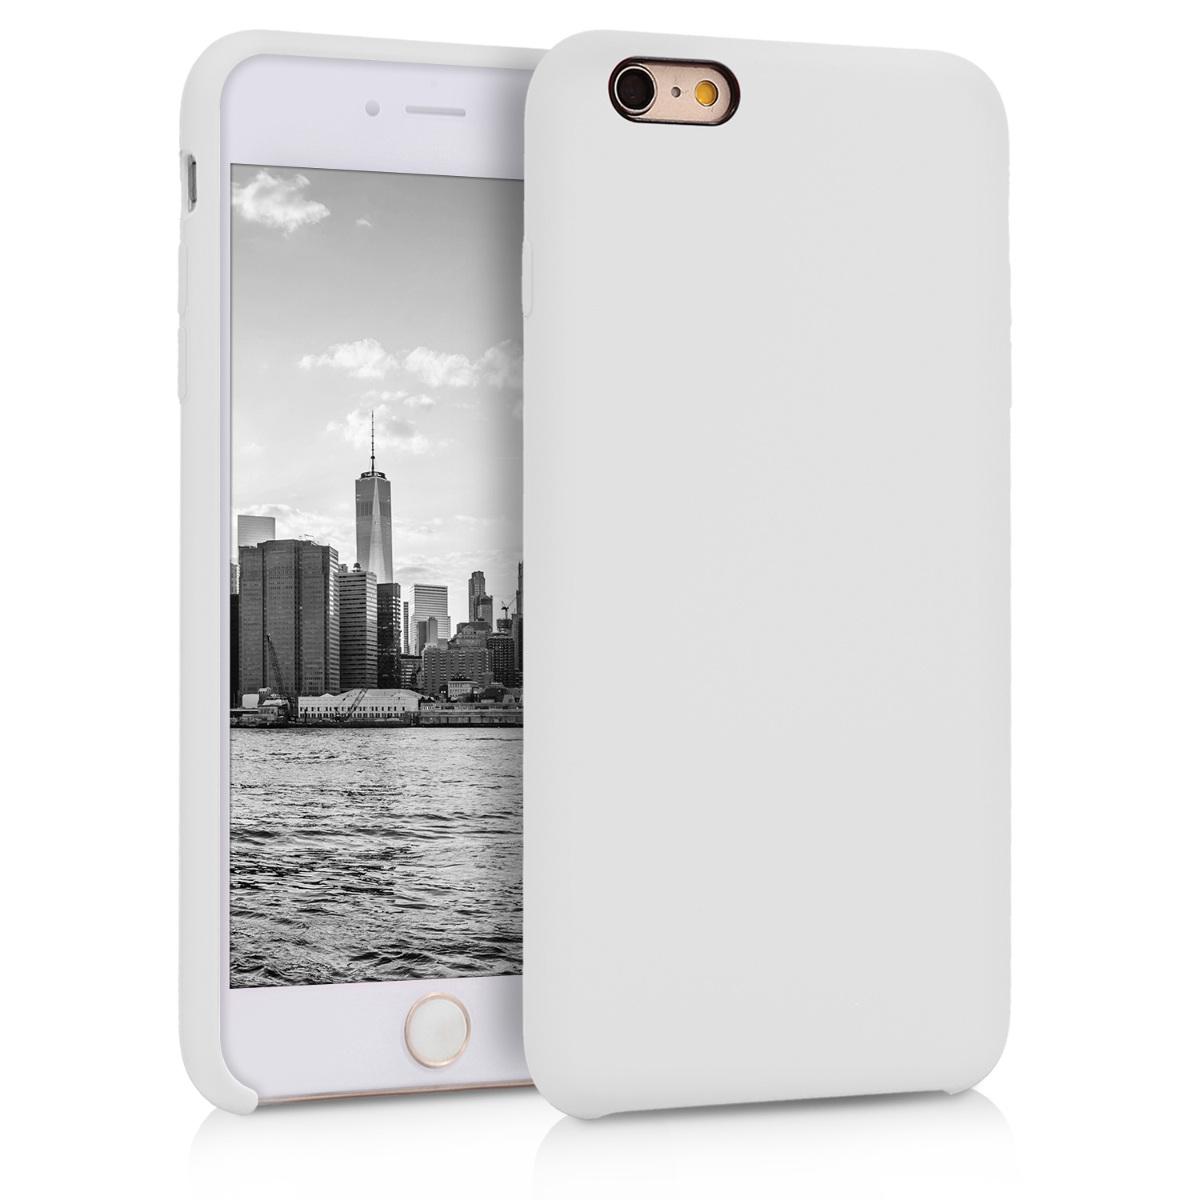 KW TPU Θήκη Σιλικόνης Apple iPhone 6 Plus / 6S Plus - Soft Flexible Rubber - White (40841.02)